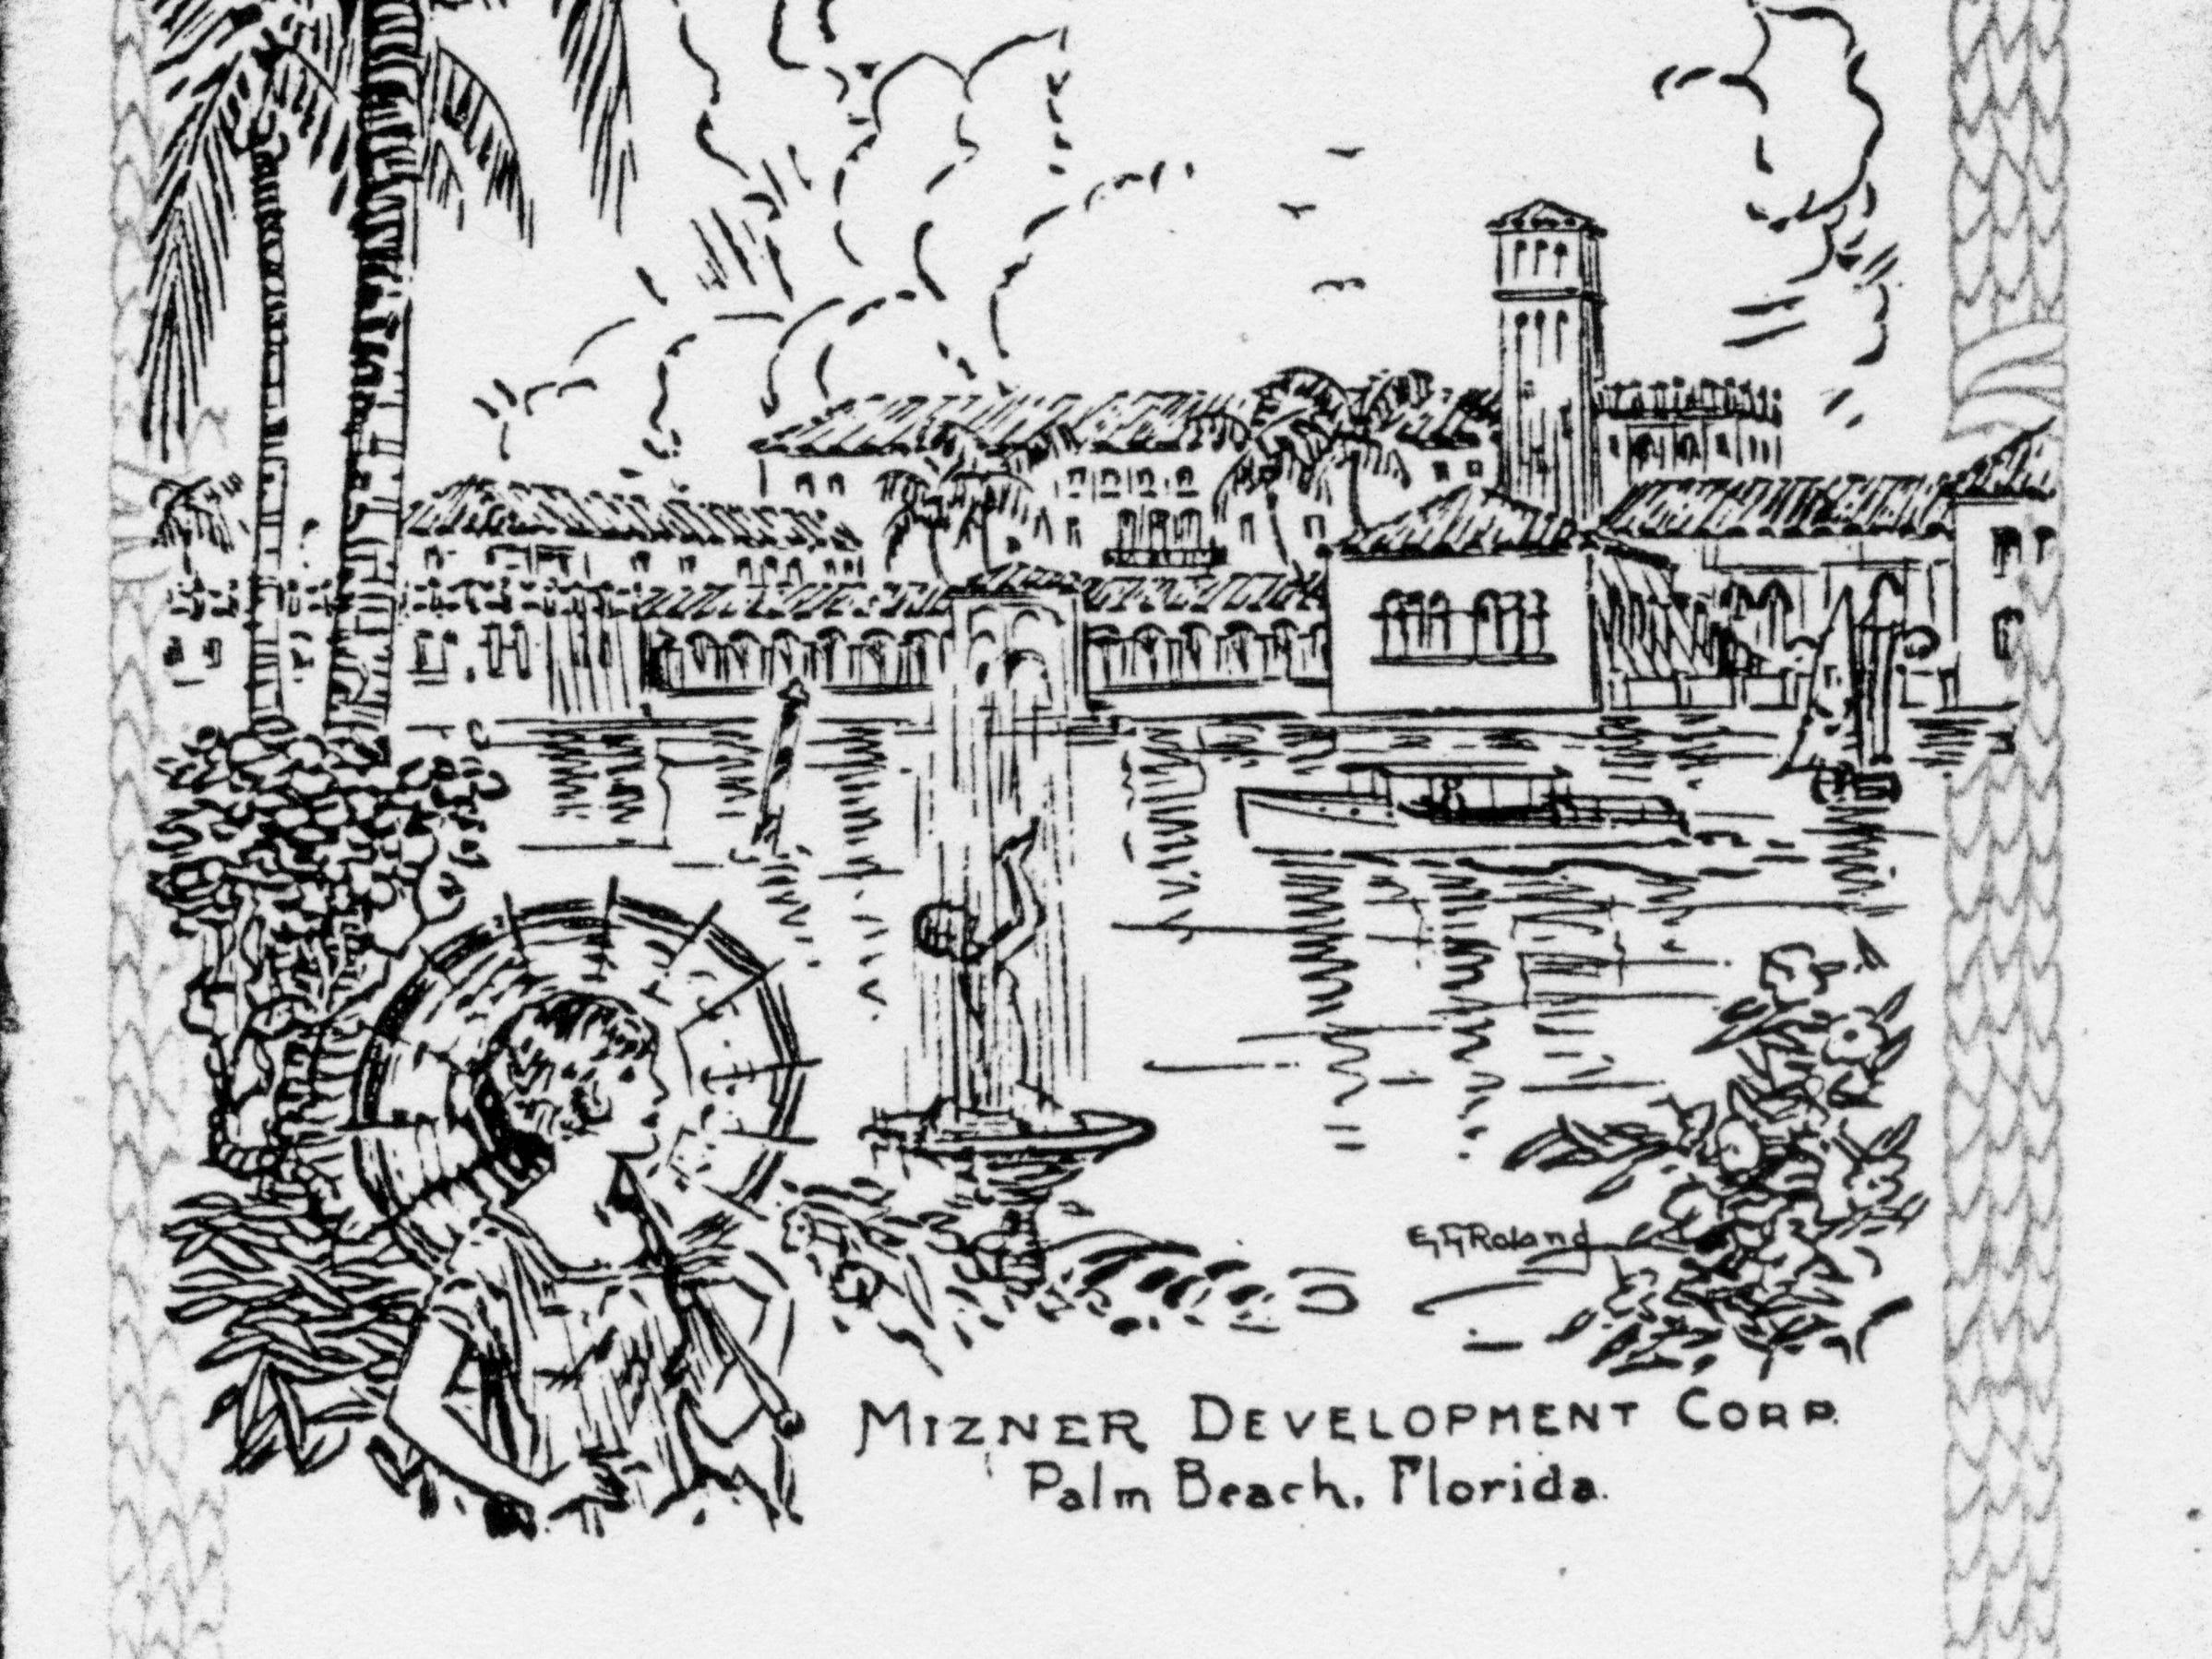 A brochure promoting Boca Raton.